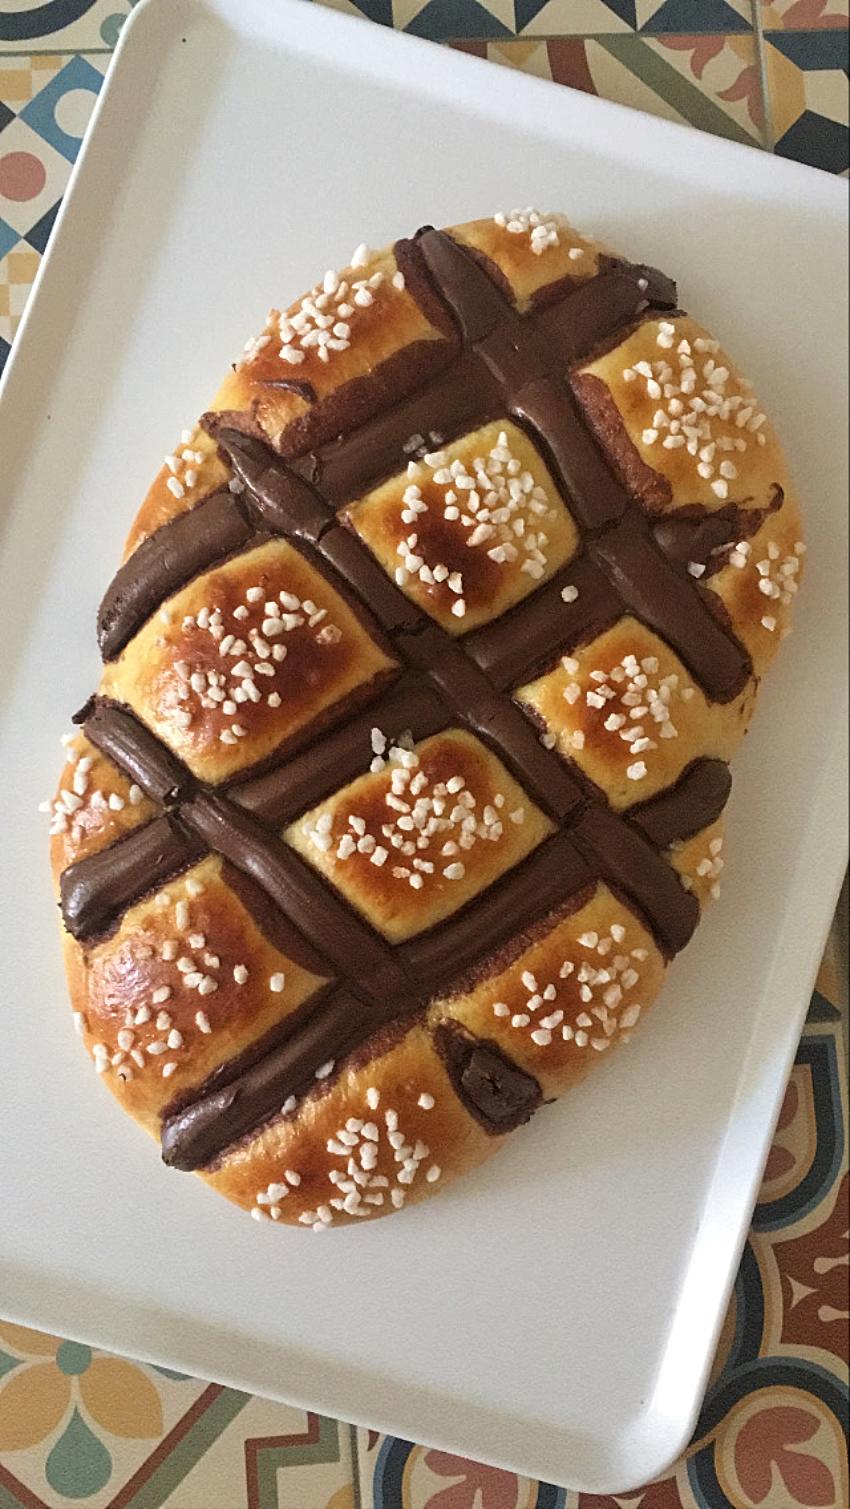 coca-de-sant-joan-de-nutella